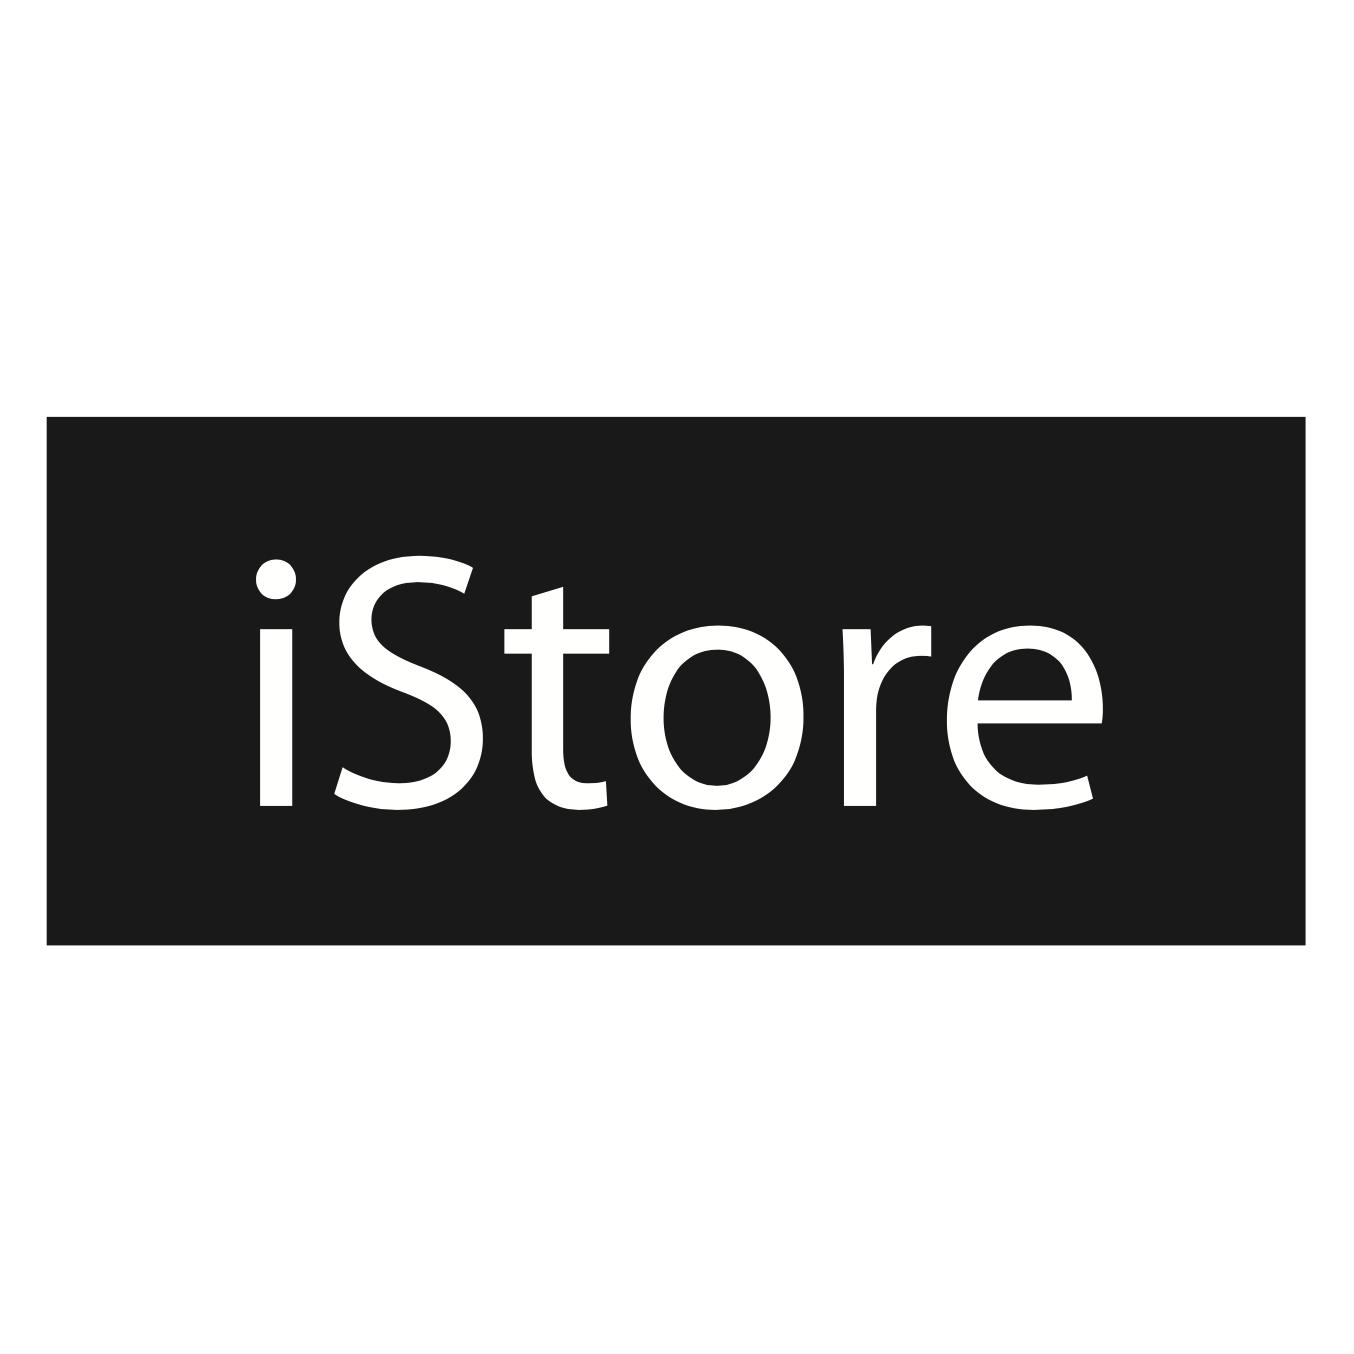 iPhone Xs Max Silicone Case - Black